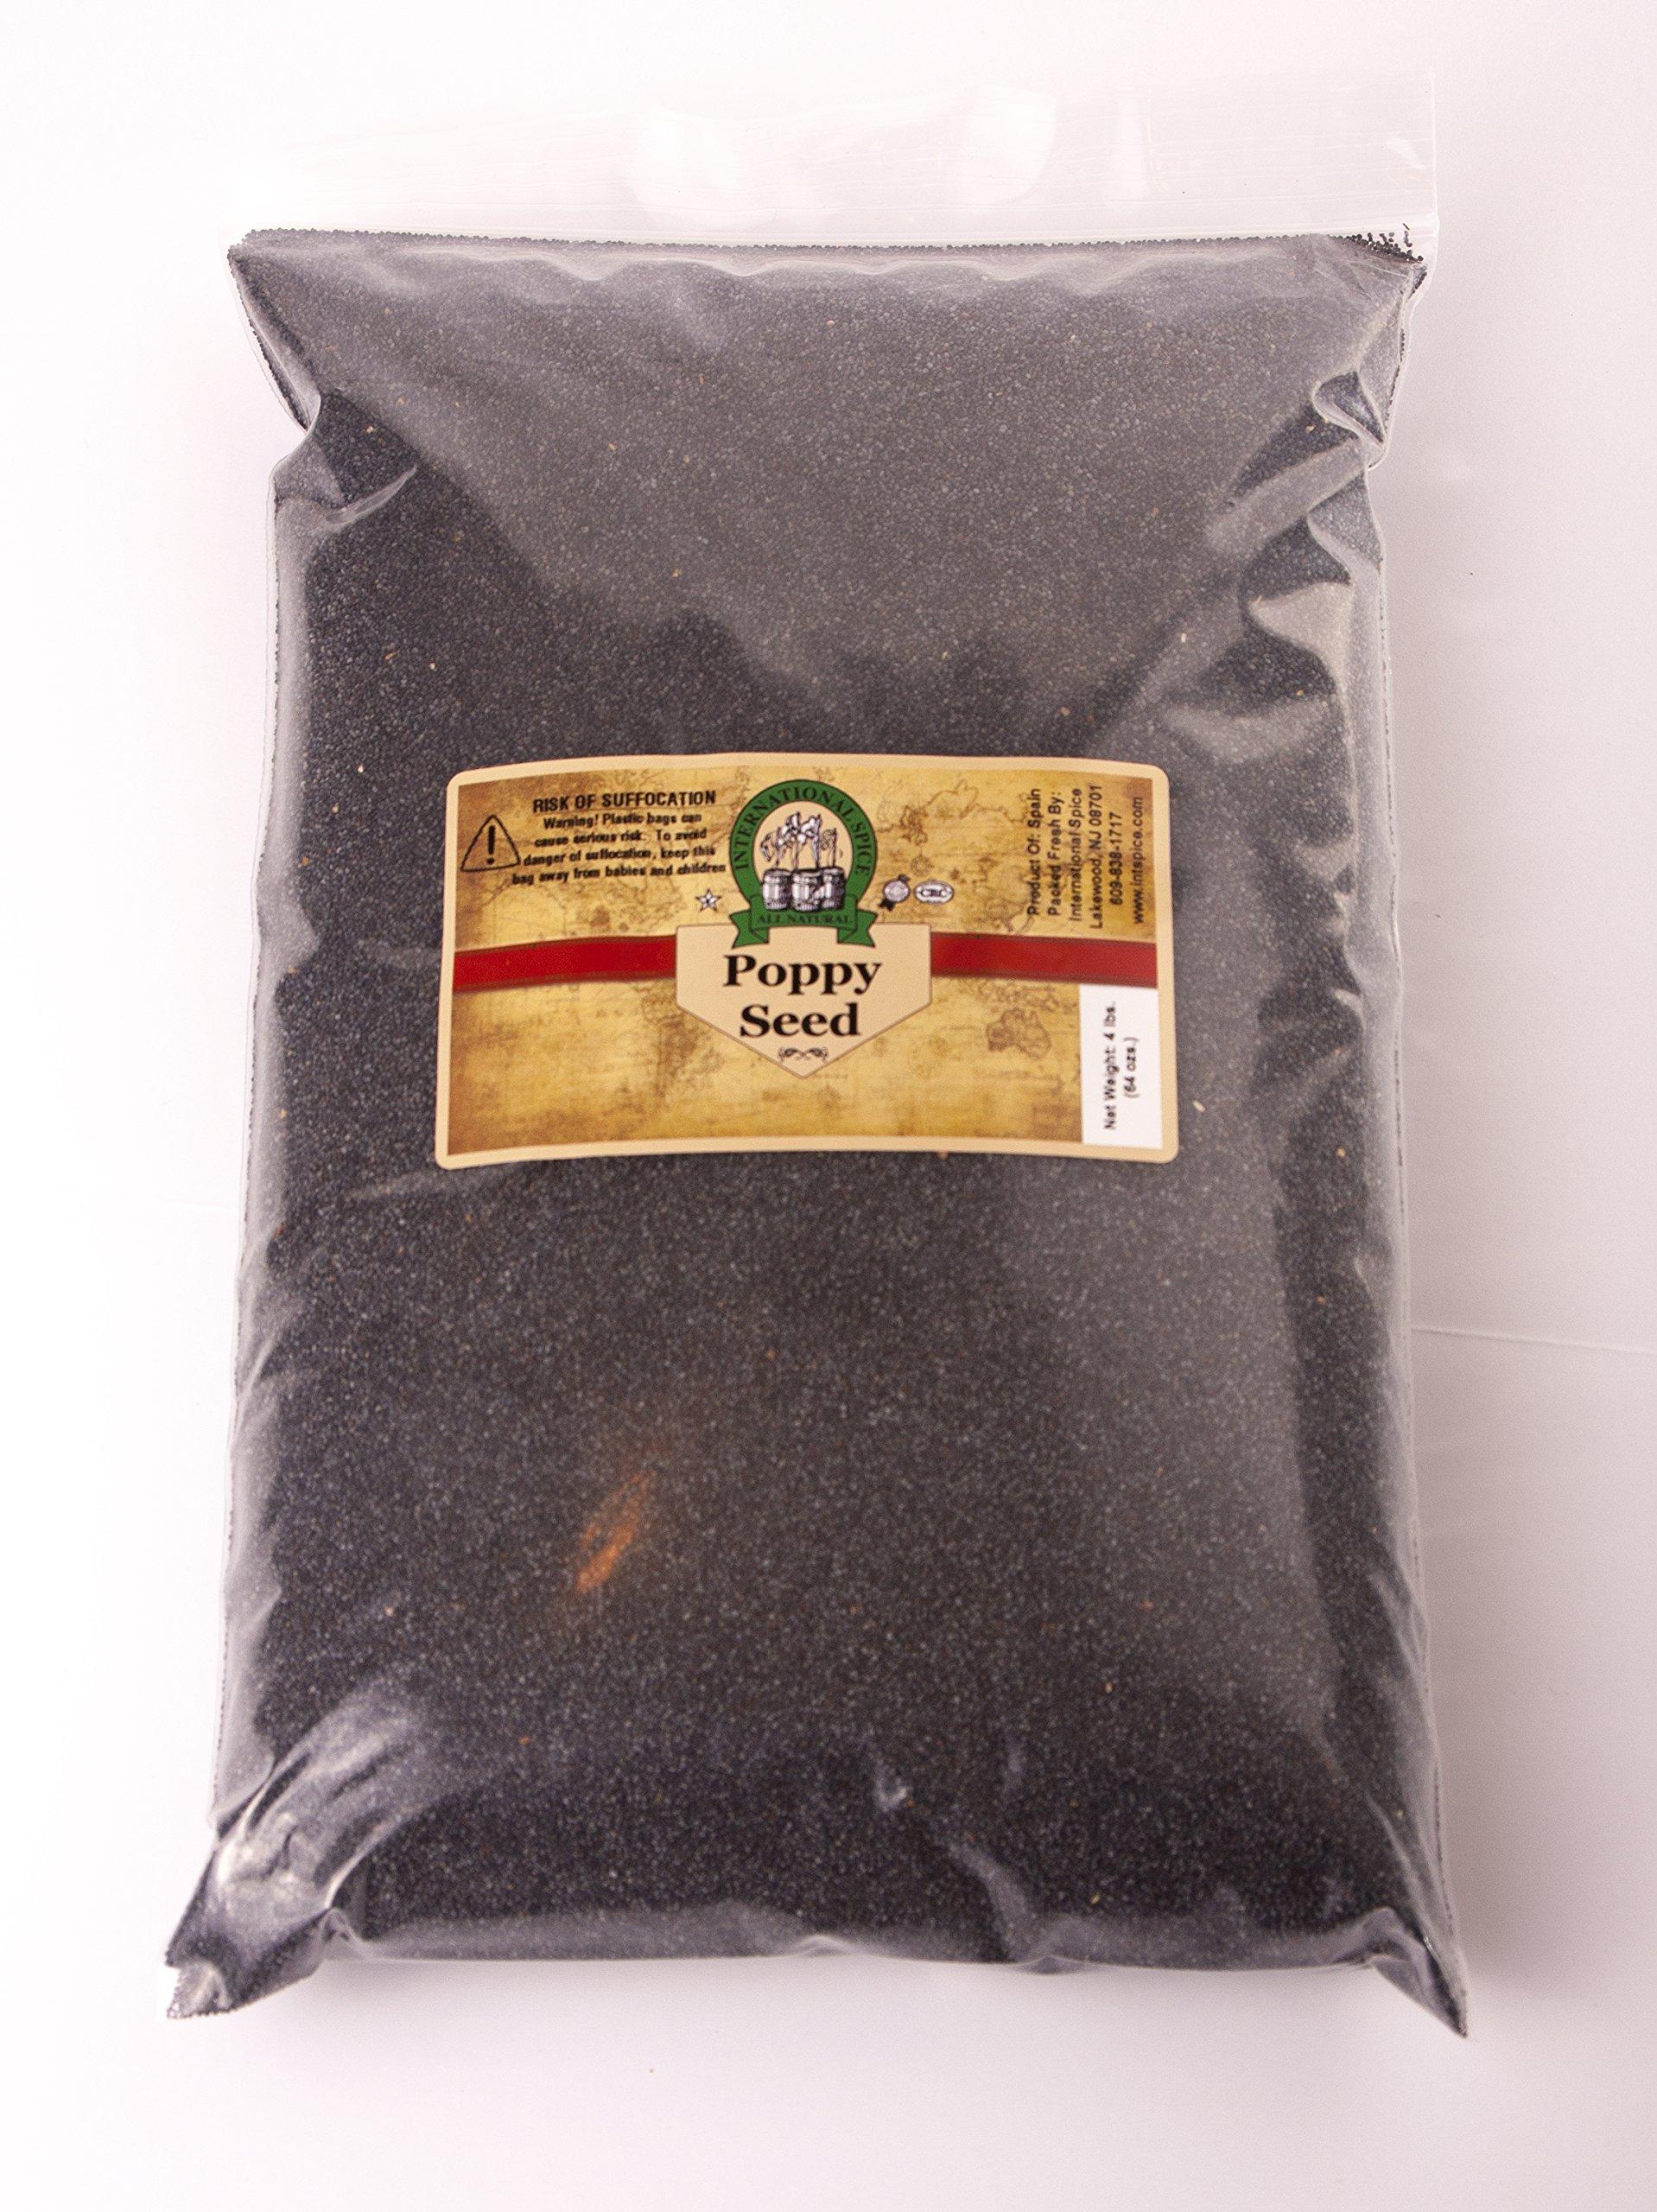 INTERNATIONAL SPICE- POPPY SEEDS - 4 Pounds, (Variety: Blue; Grade: A-1) (4 LBS)